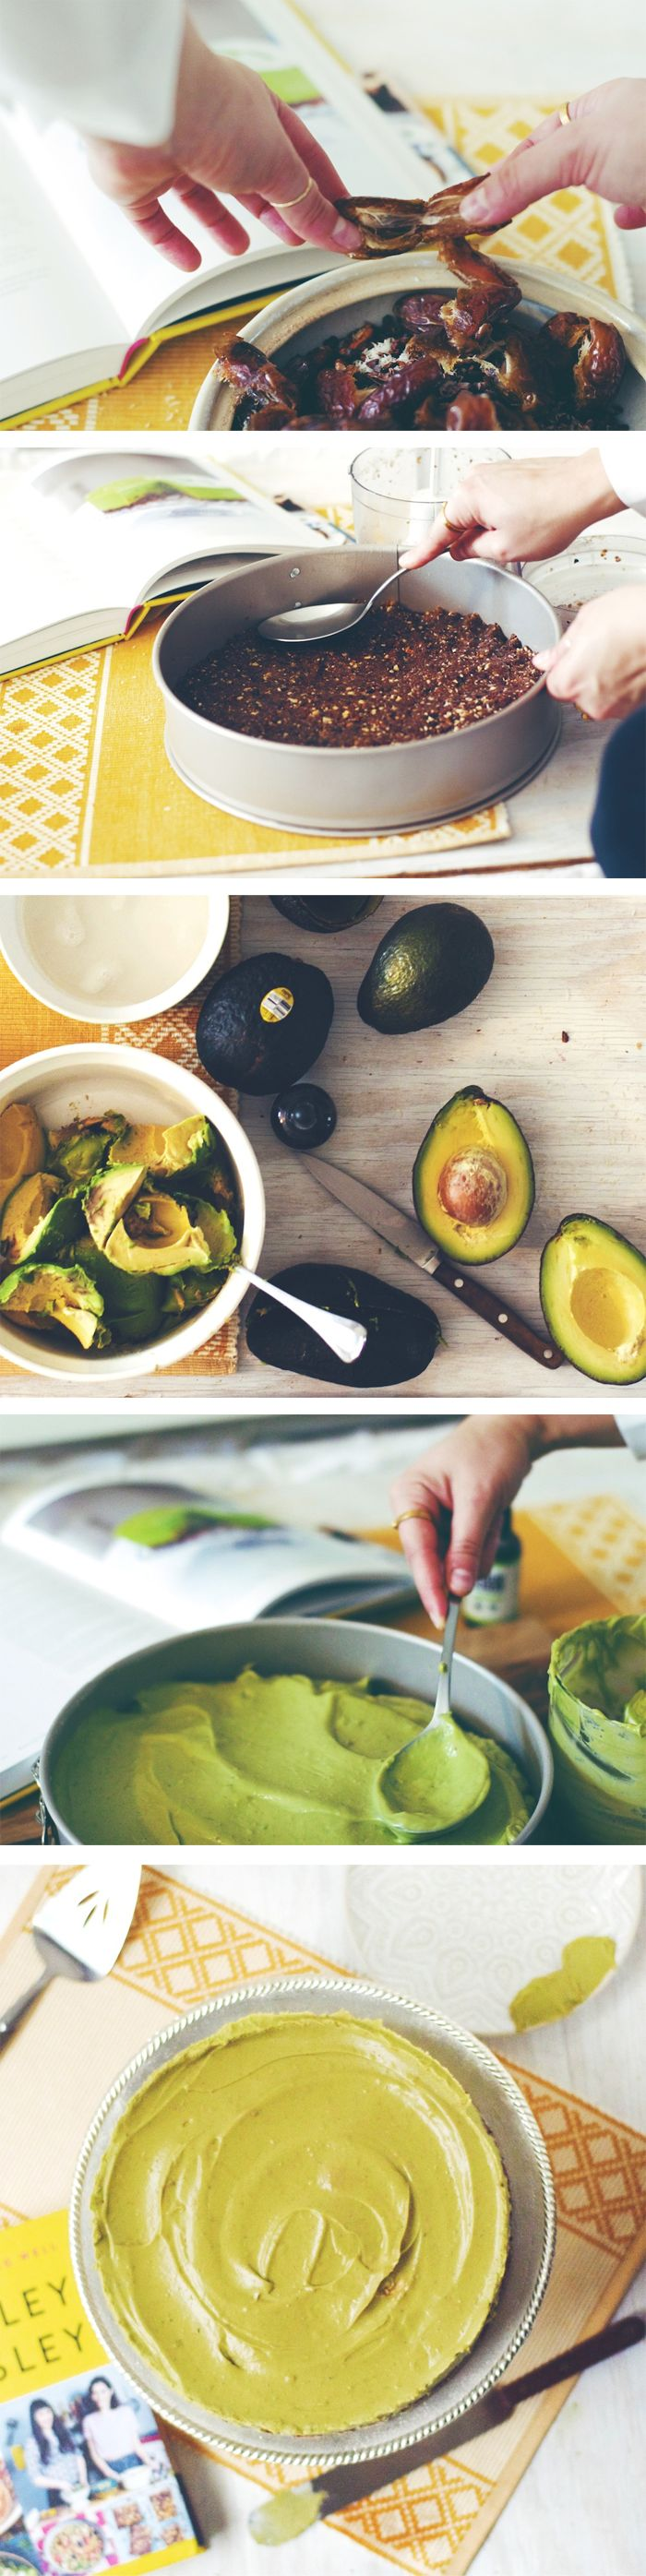 Urban Outfitters - Blog - On the Menu: Avocado Cheesecake Recipe